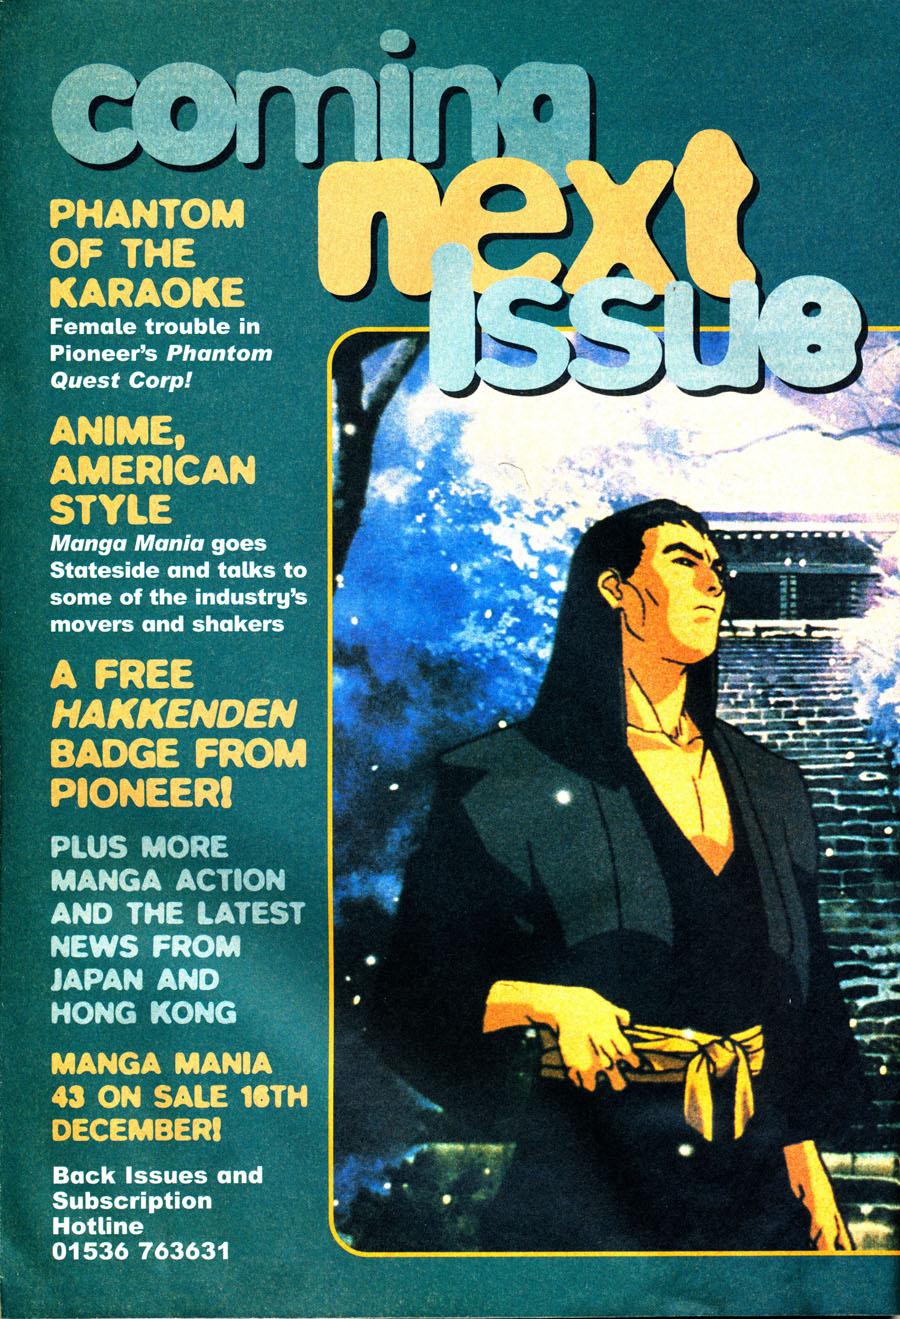 manga-mania-next-issue